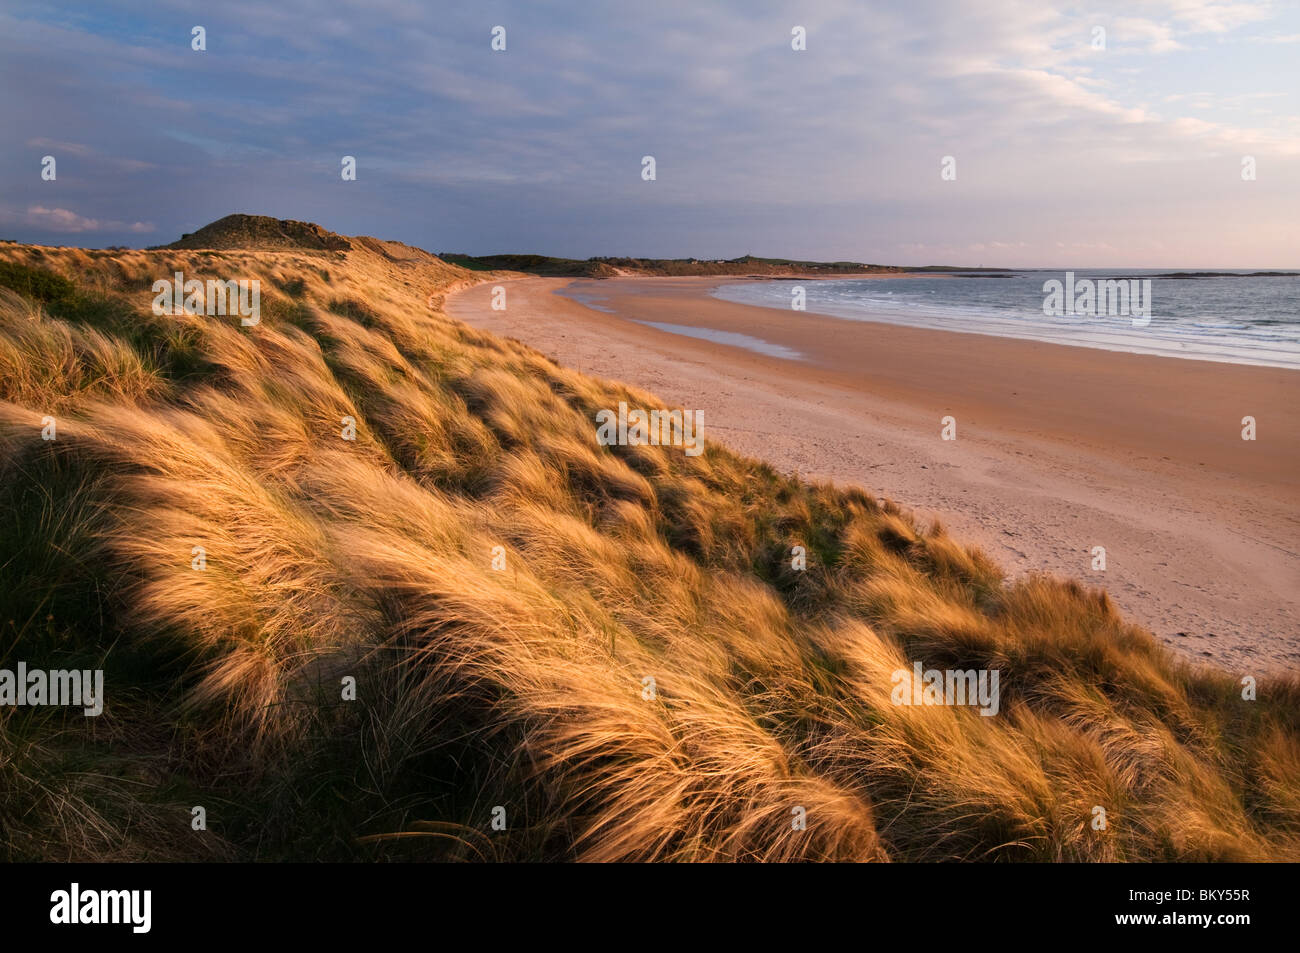 Golden sand dunes of Embleton Bay Northumberland - Stock Image